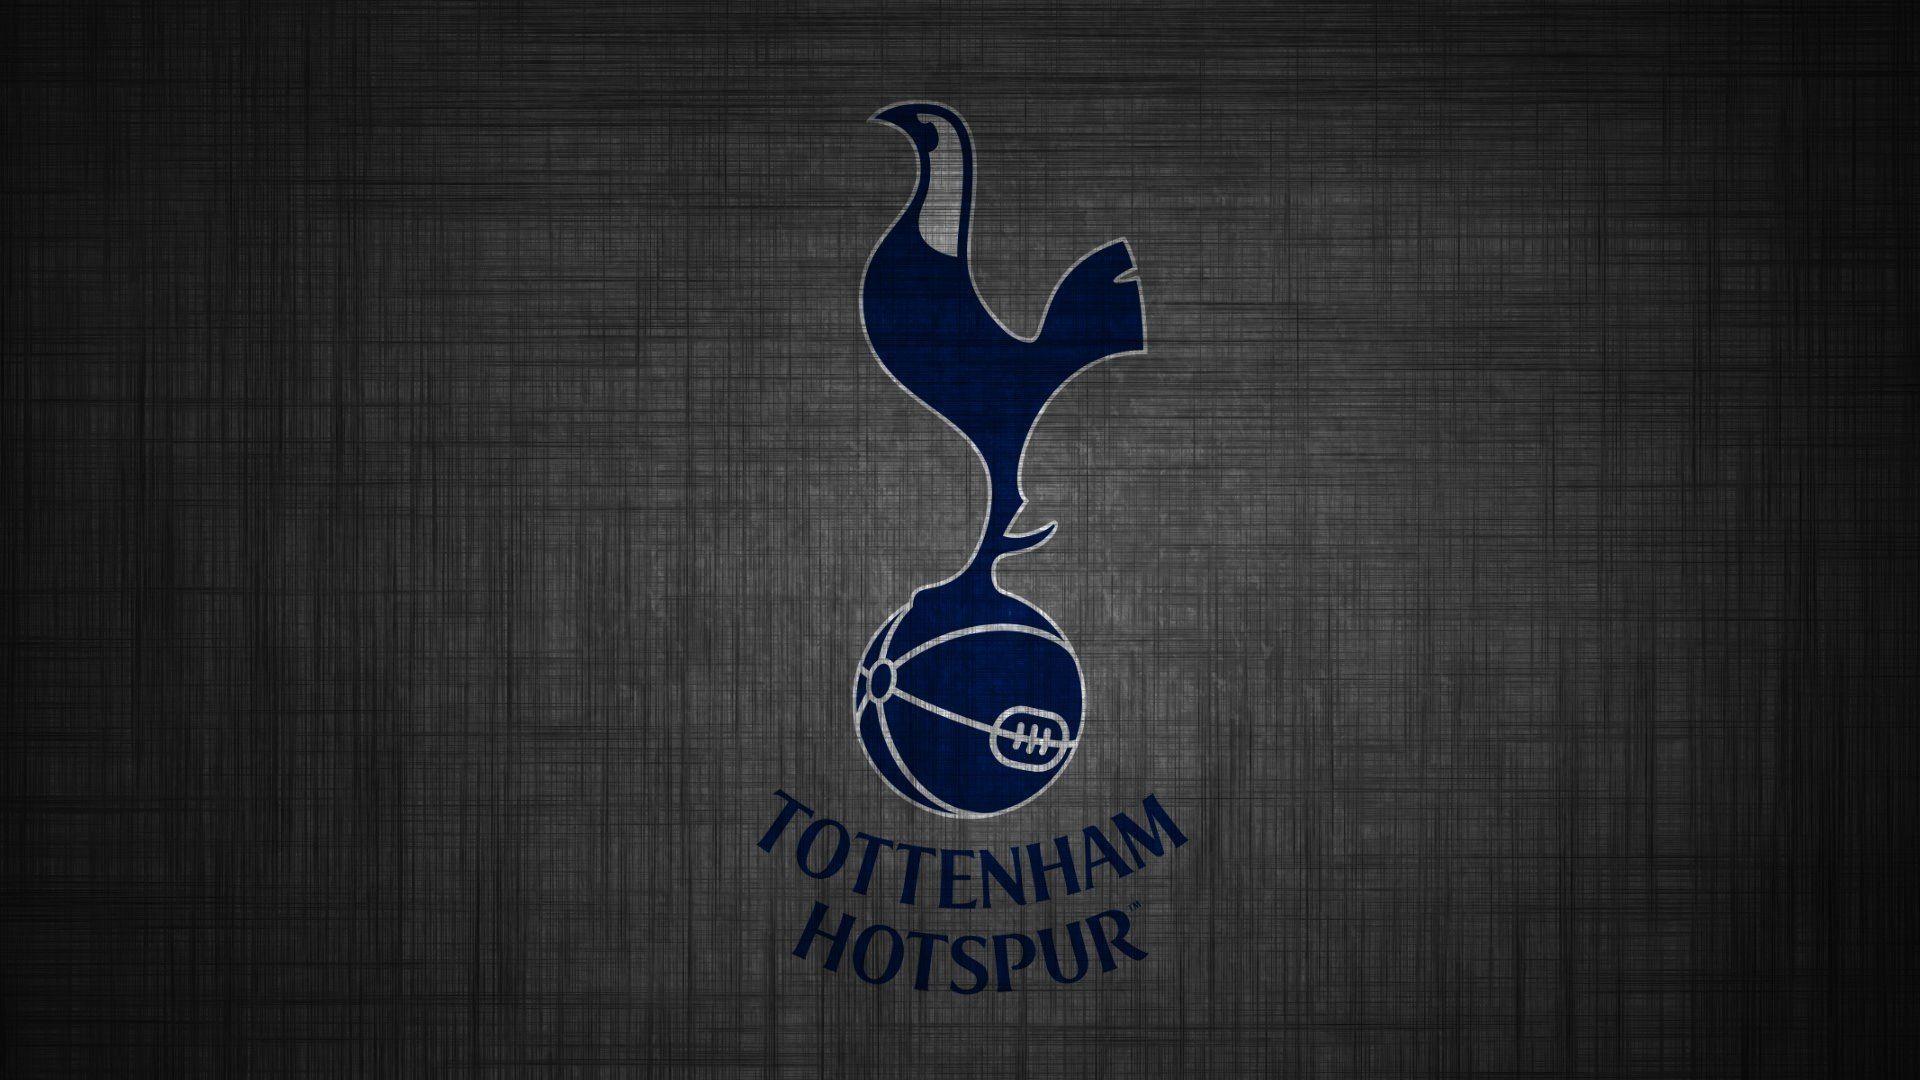 Tottenham Hotspur Wallpapers   Just Good Vibe